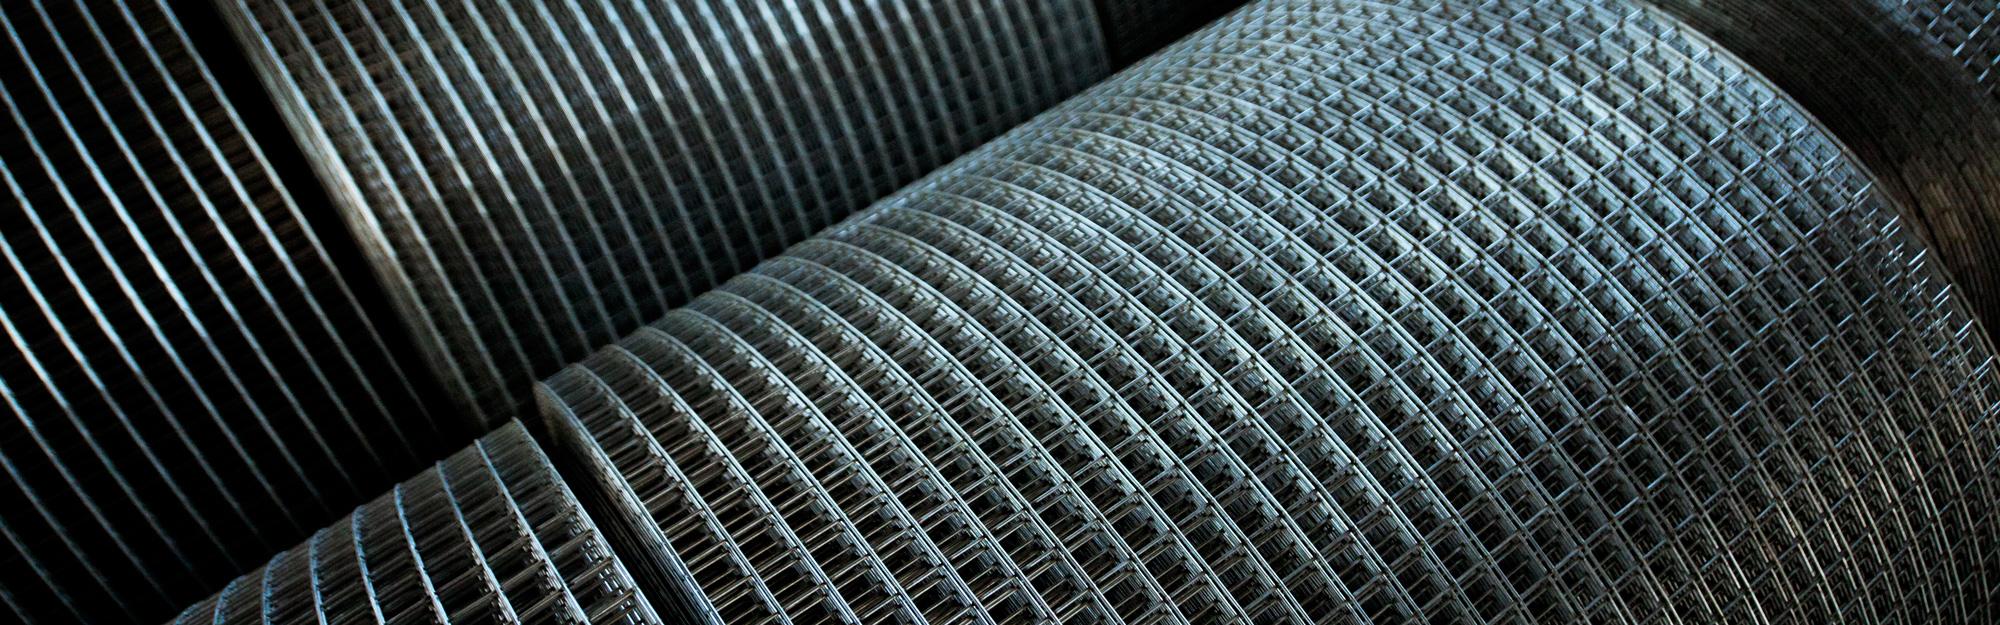 Cavatorta | Recinzioni Metalliche - Rete Elettrosaldata